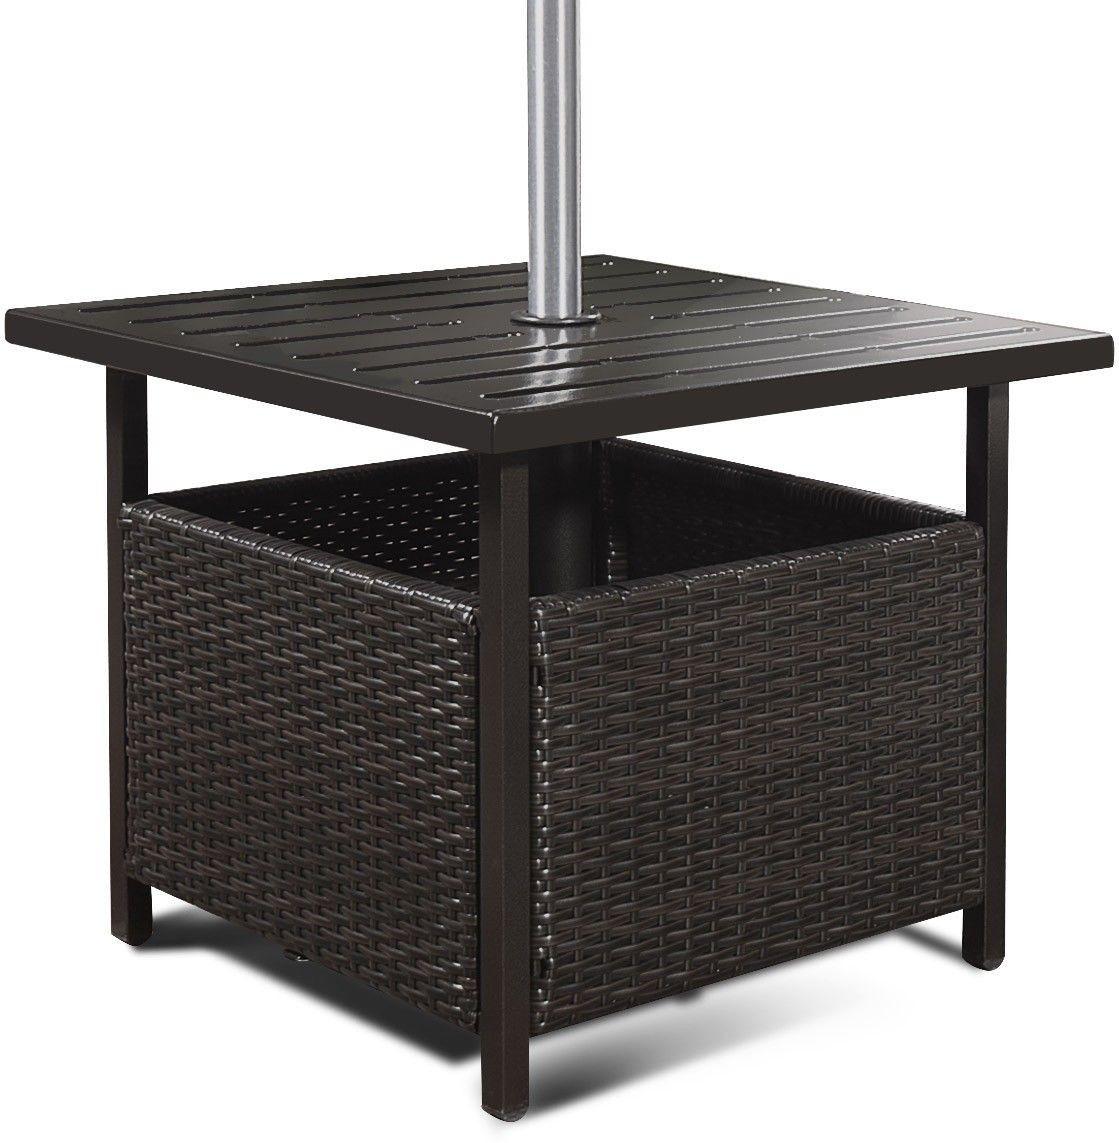 Outdoor Patio Rattan Wicker Steel Side Deck Table Outdoor Side Table Small Outdoor Table Pool Patio Furniture